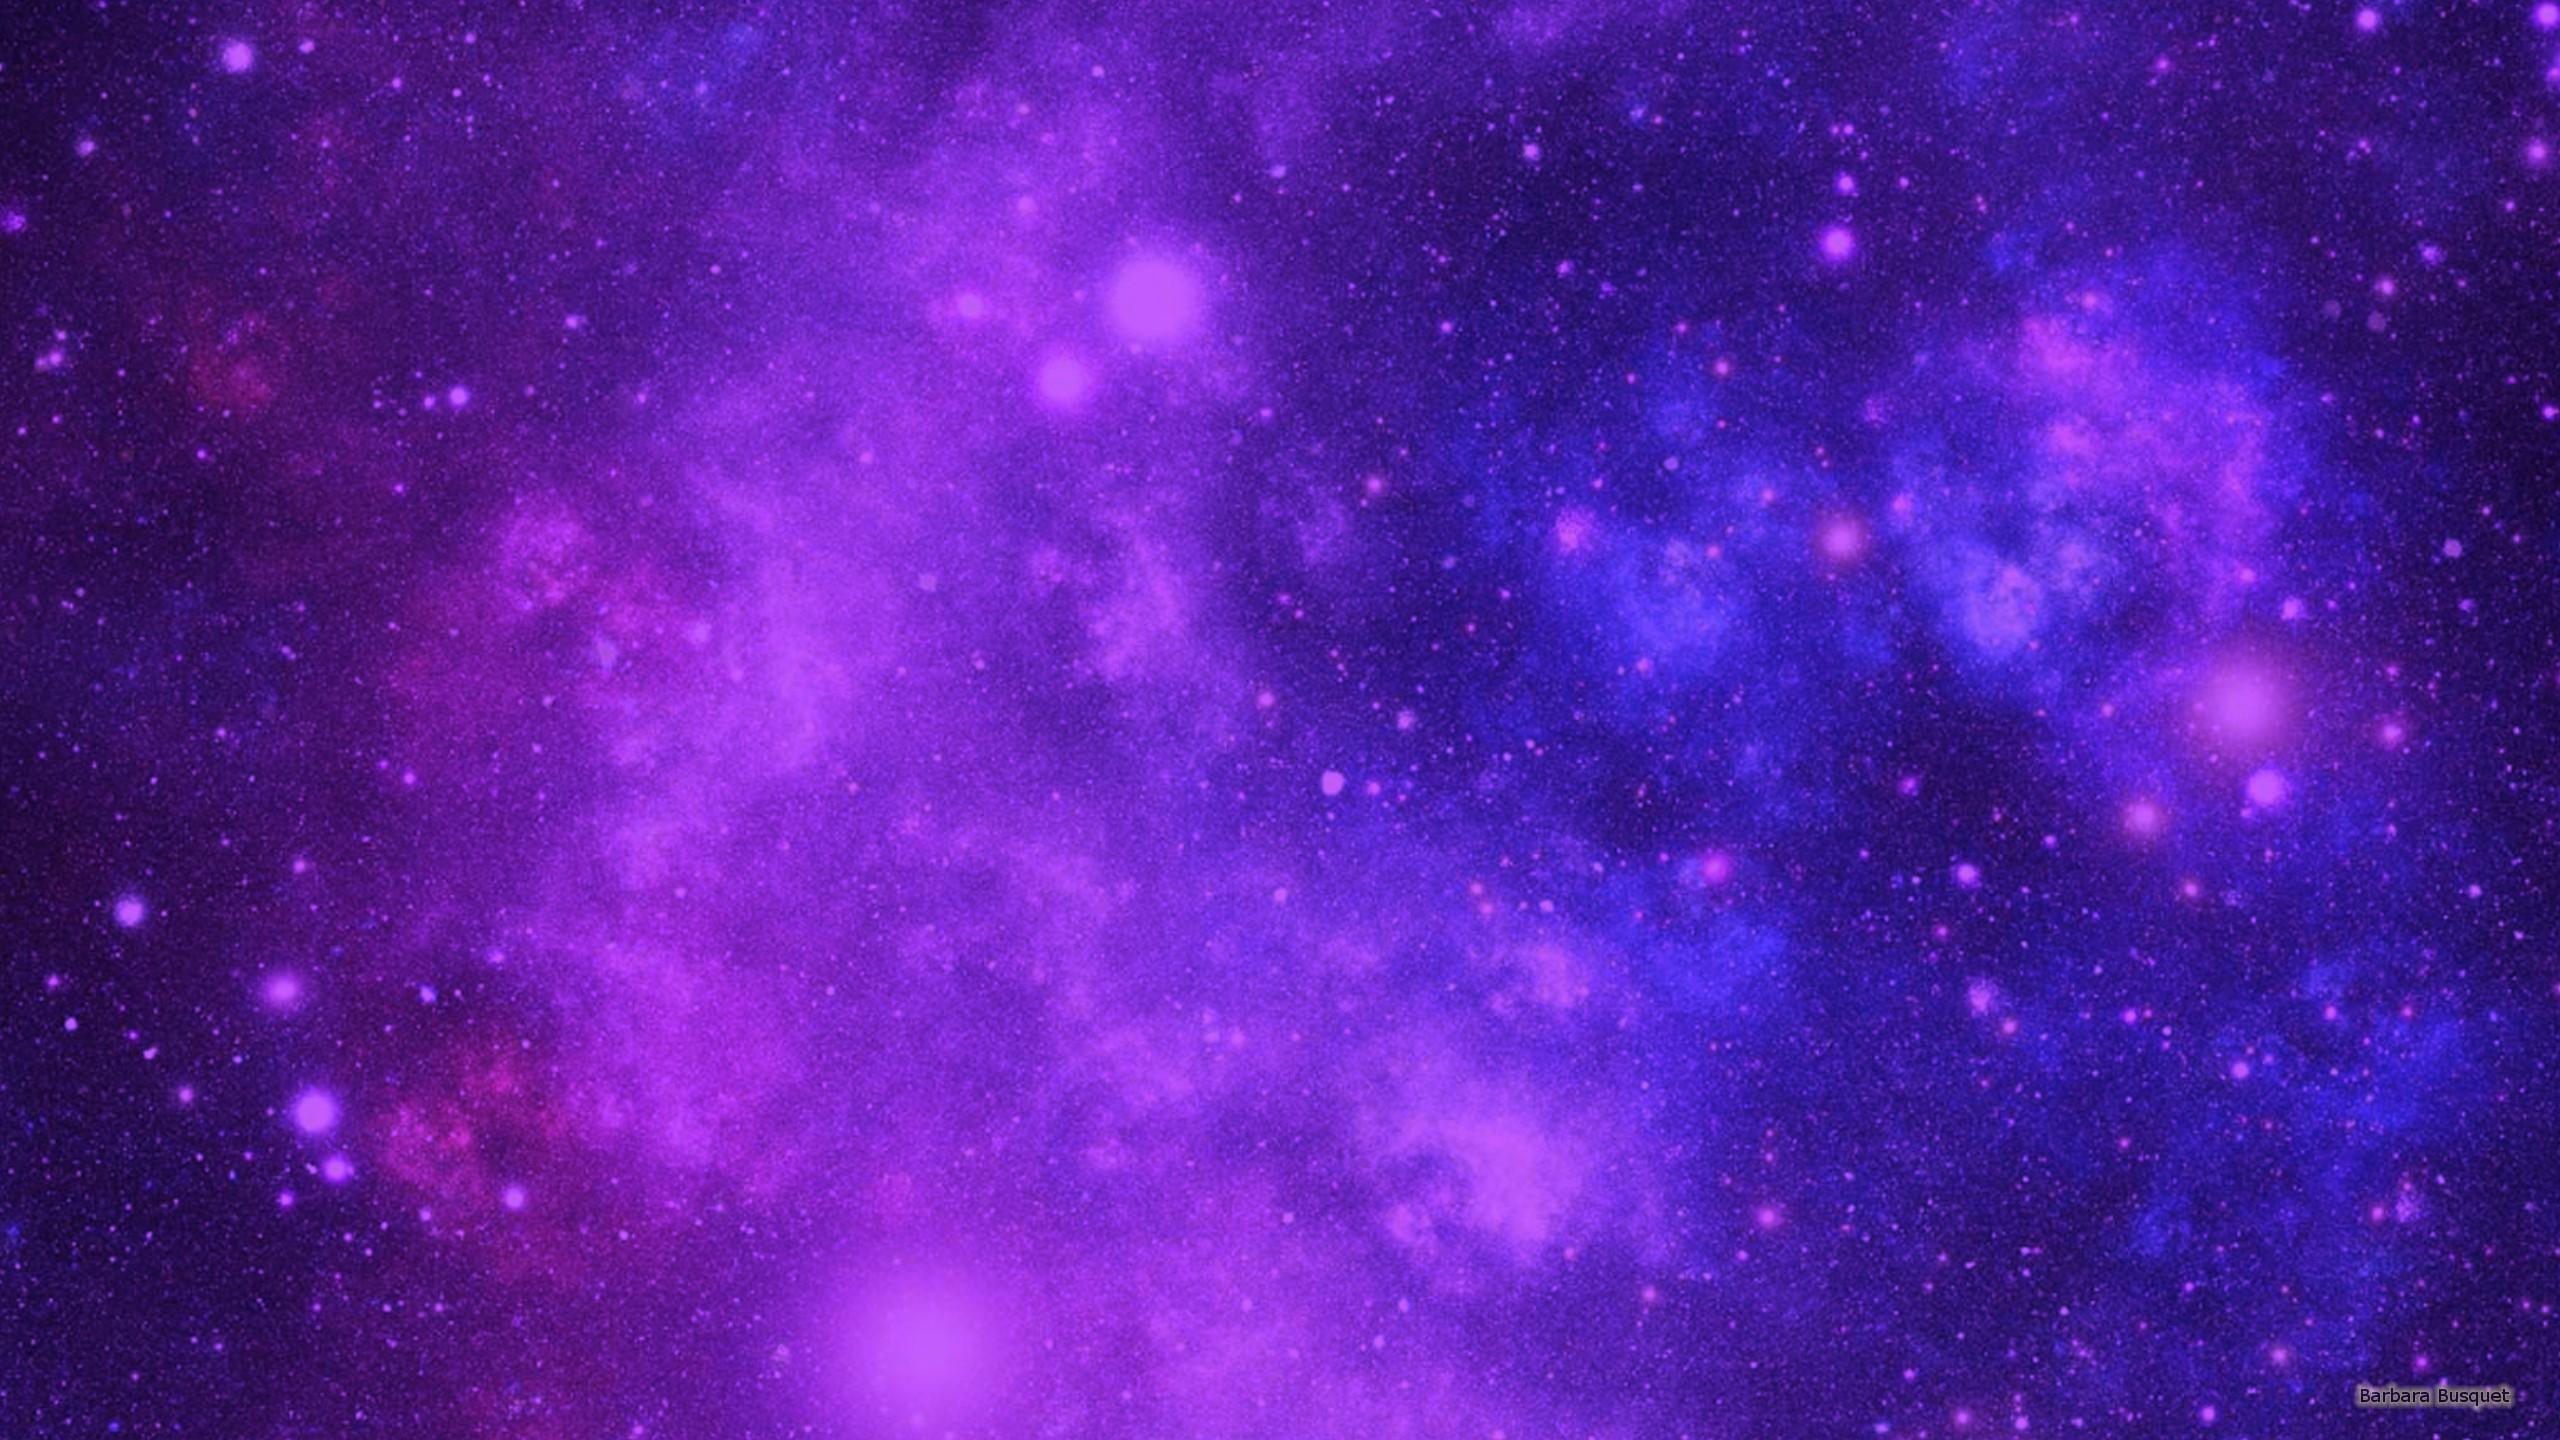 purple galaxy background - HD2560×1440